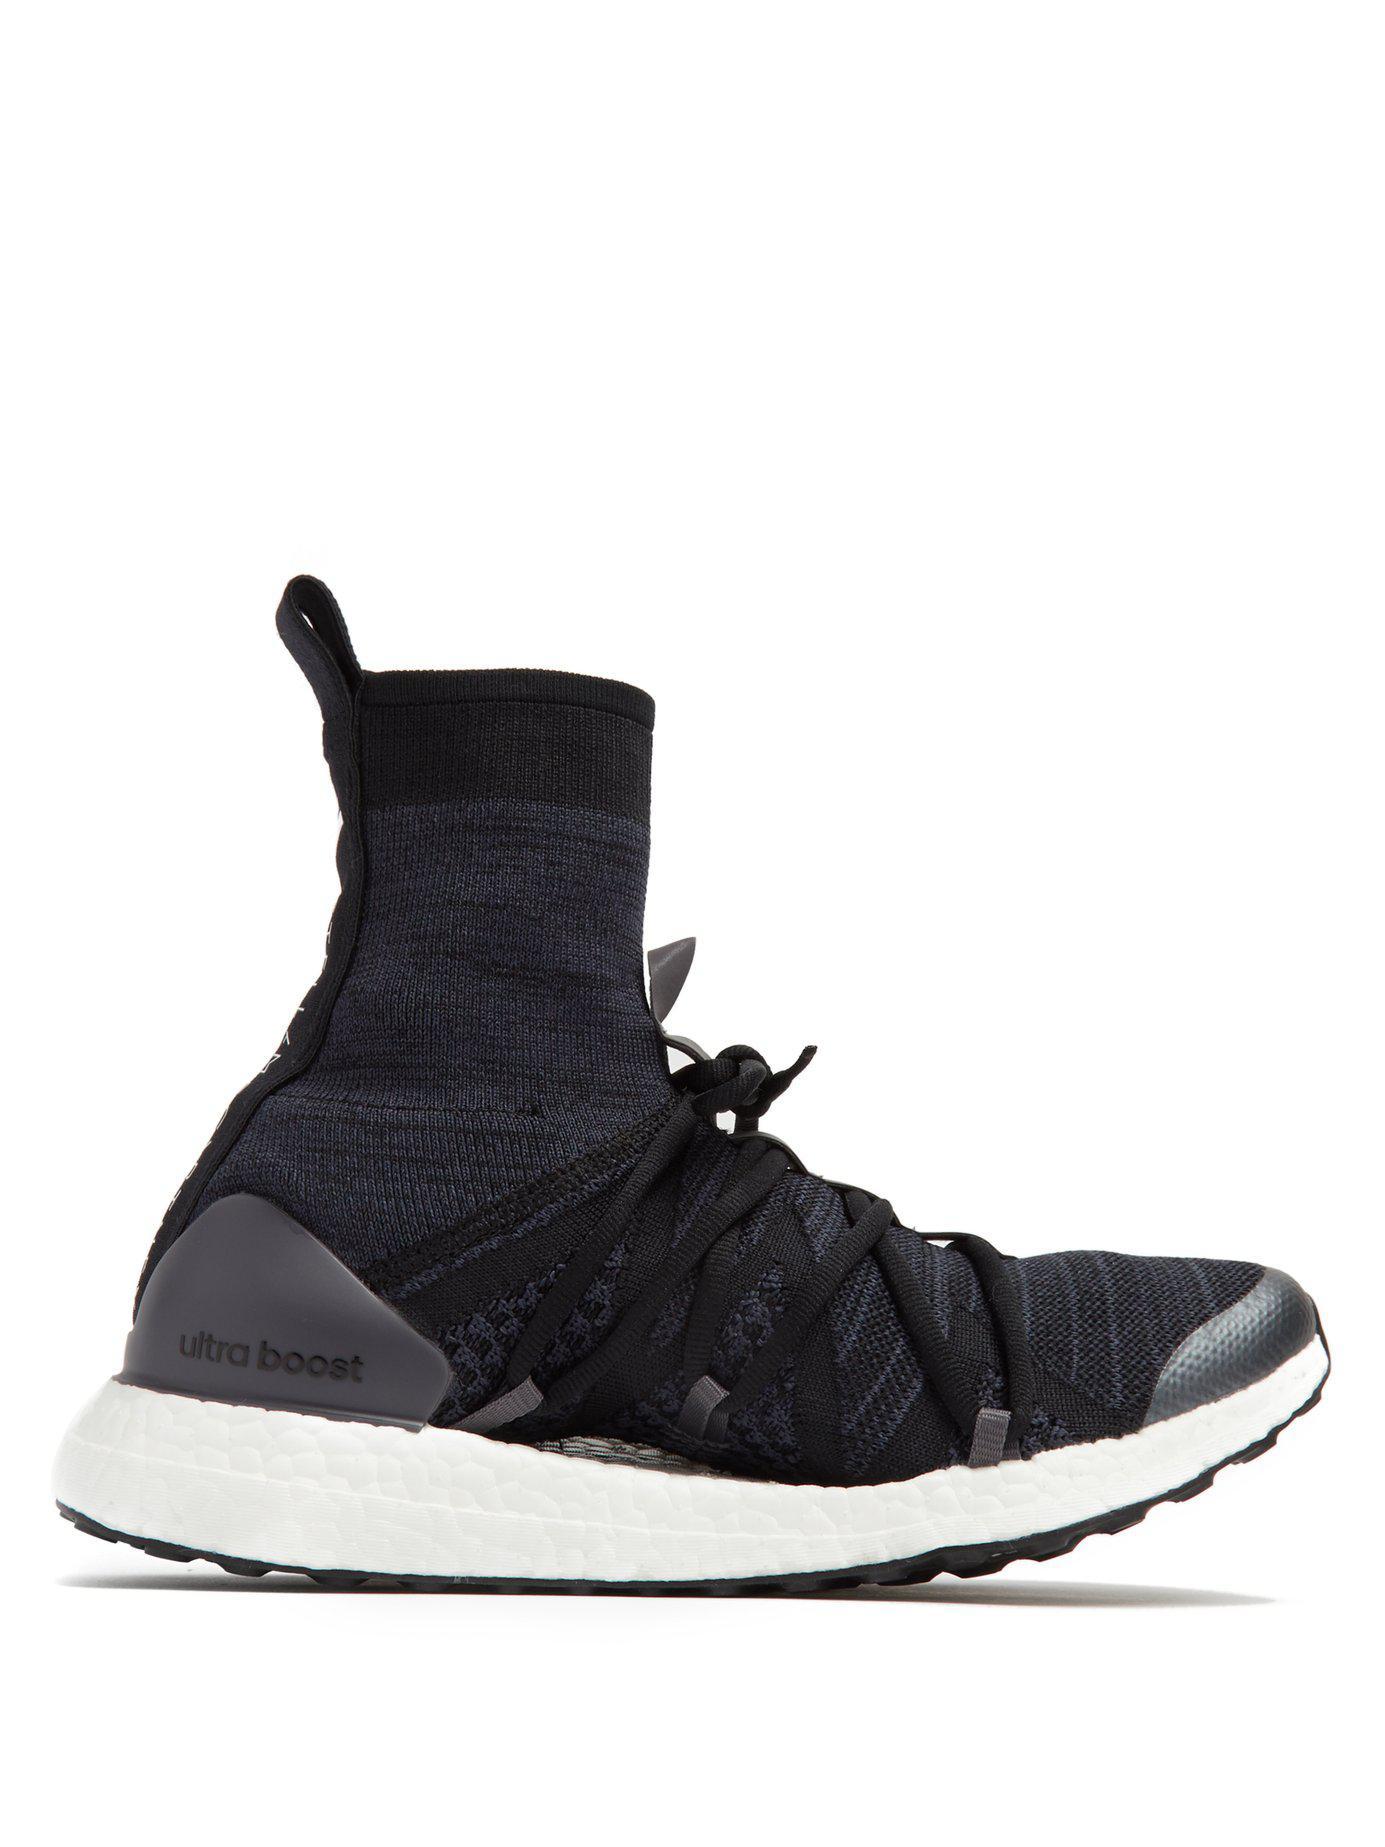 bbcc0e06a ... top quality lyst adidas by stella mccartney ultra boost x high top sock  3f085 16e95